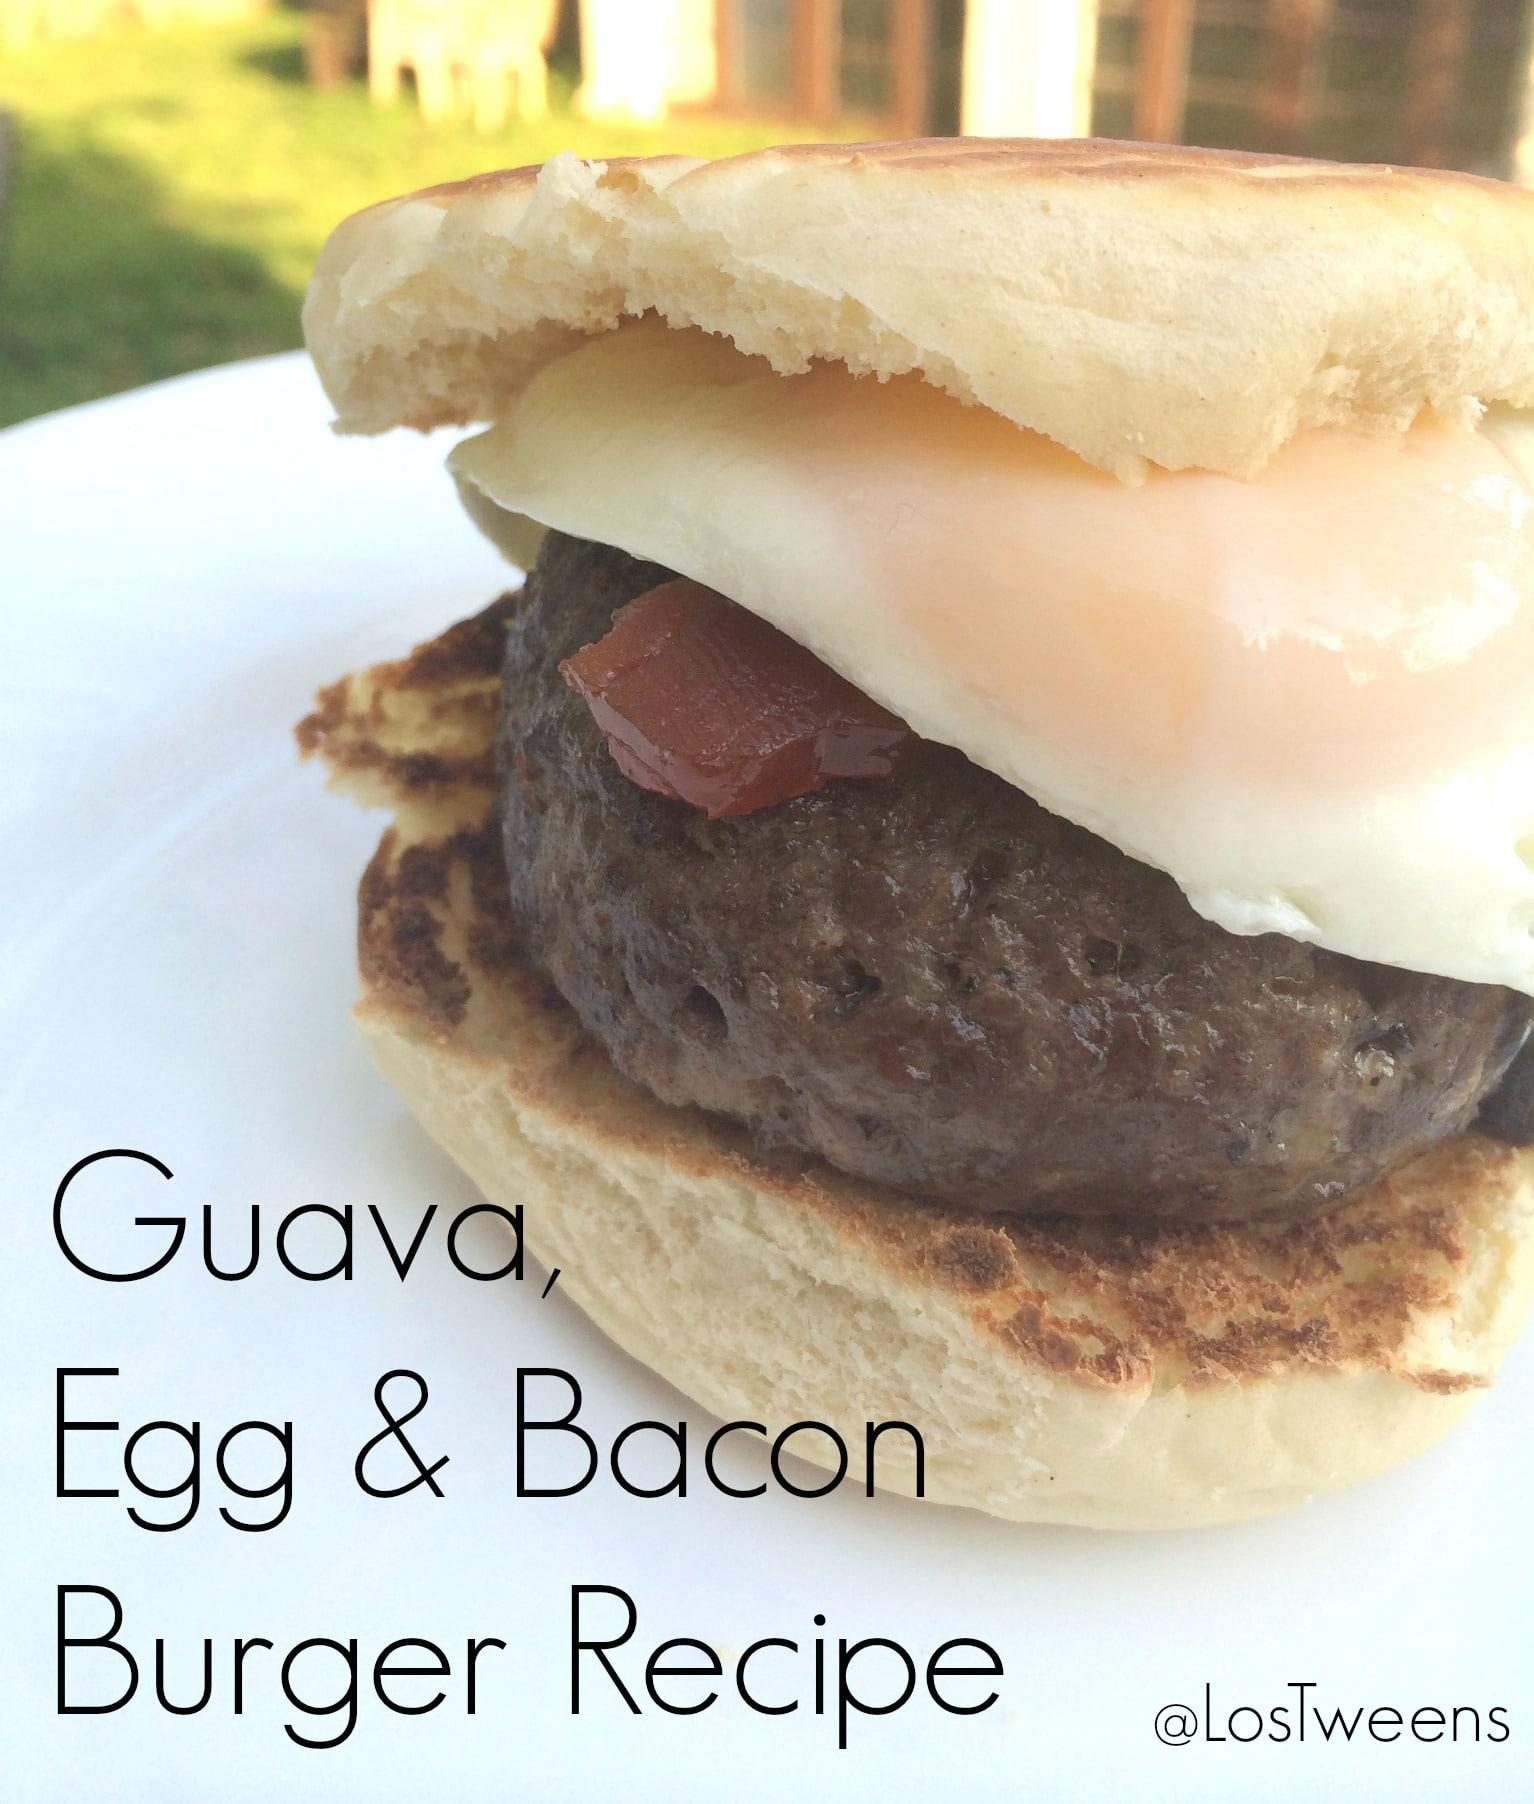 guava egg and bacon burger recipe